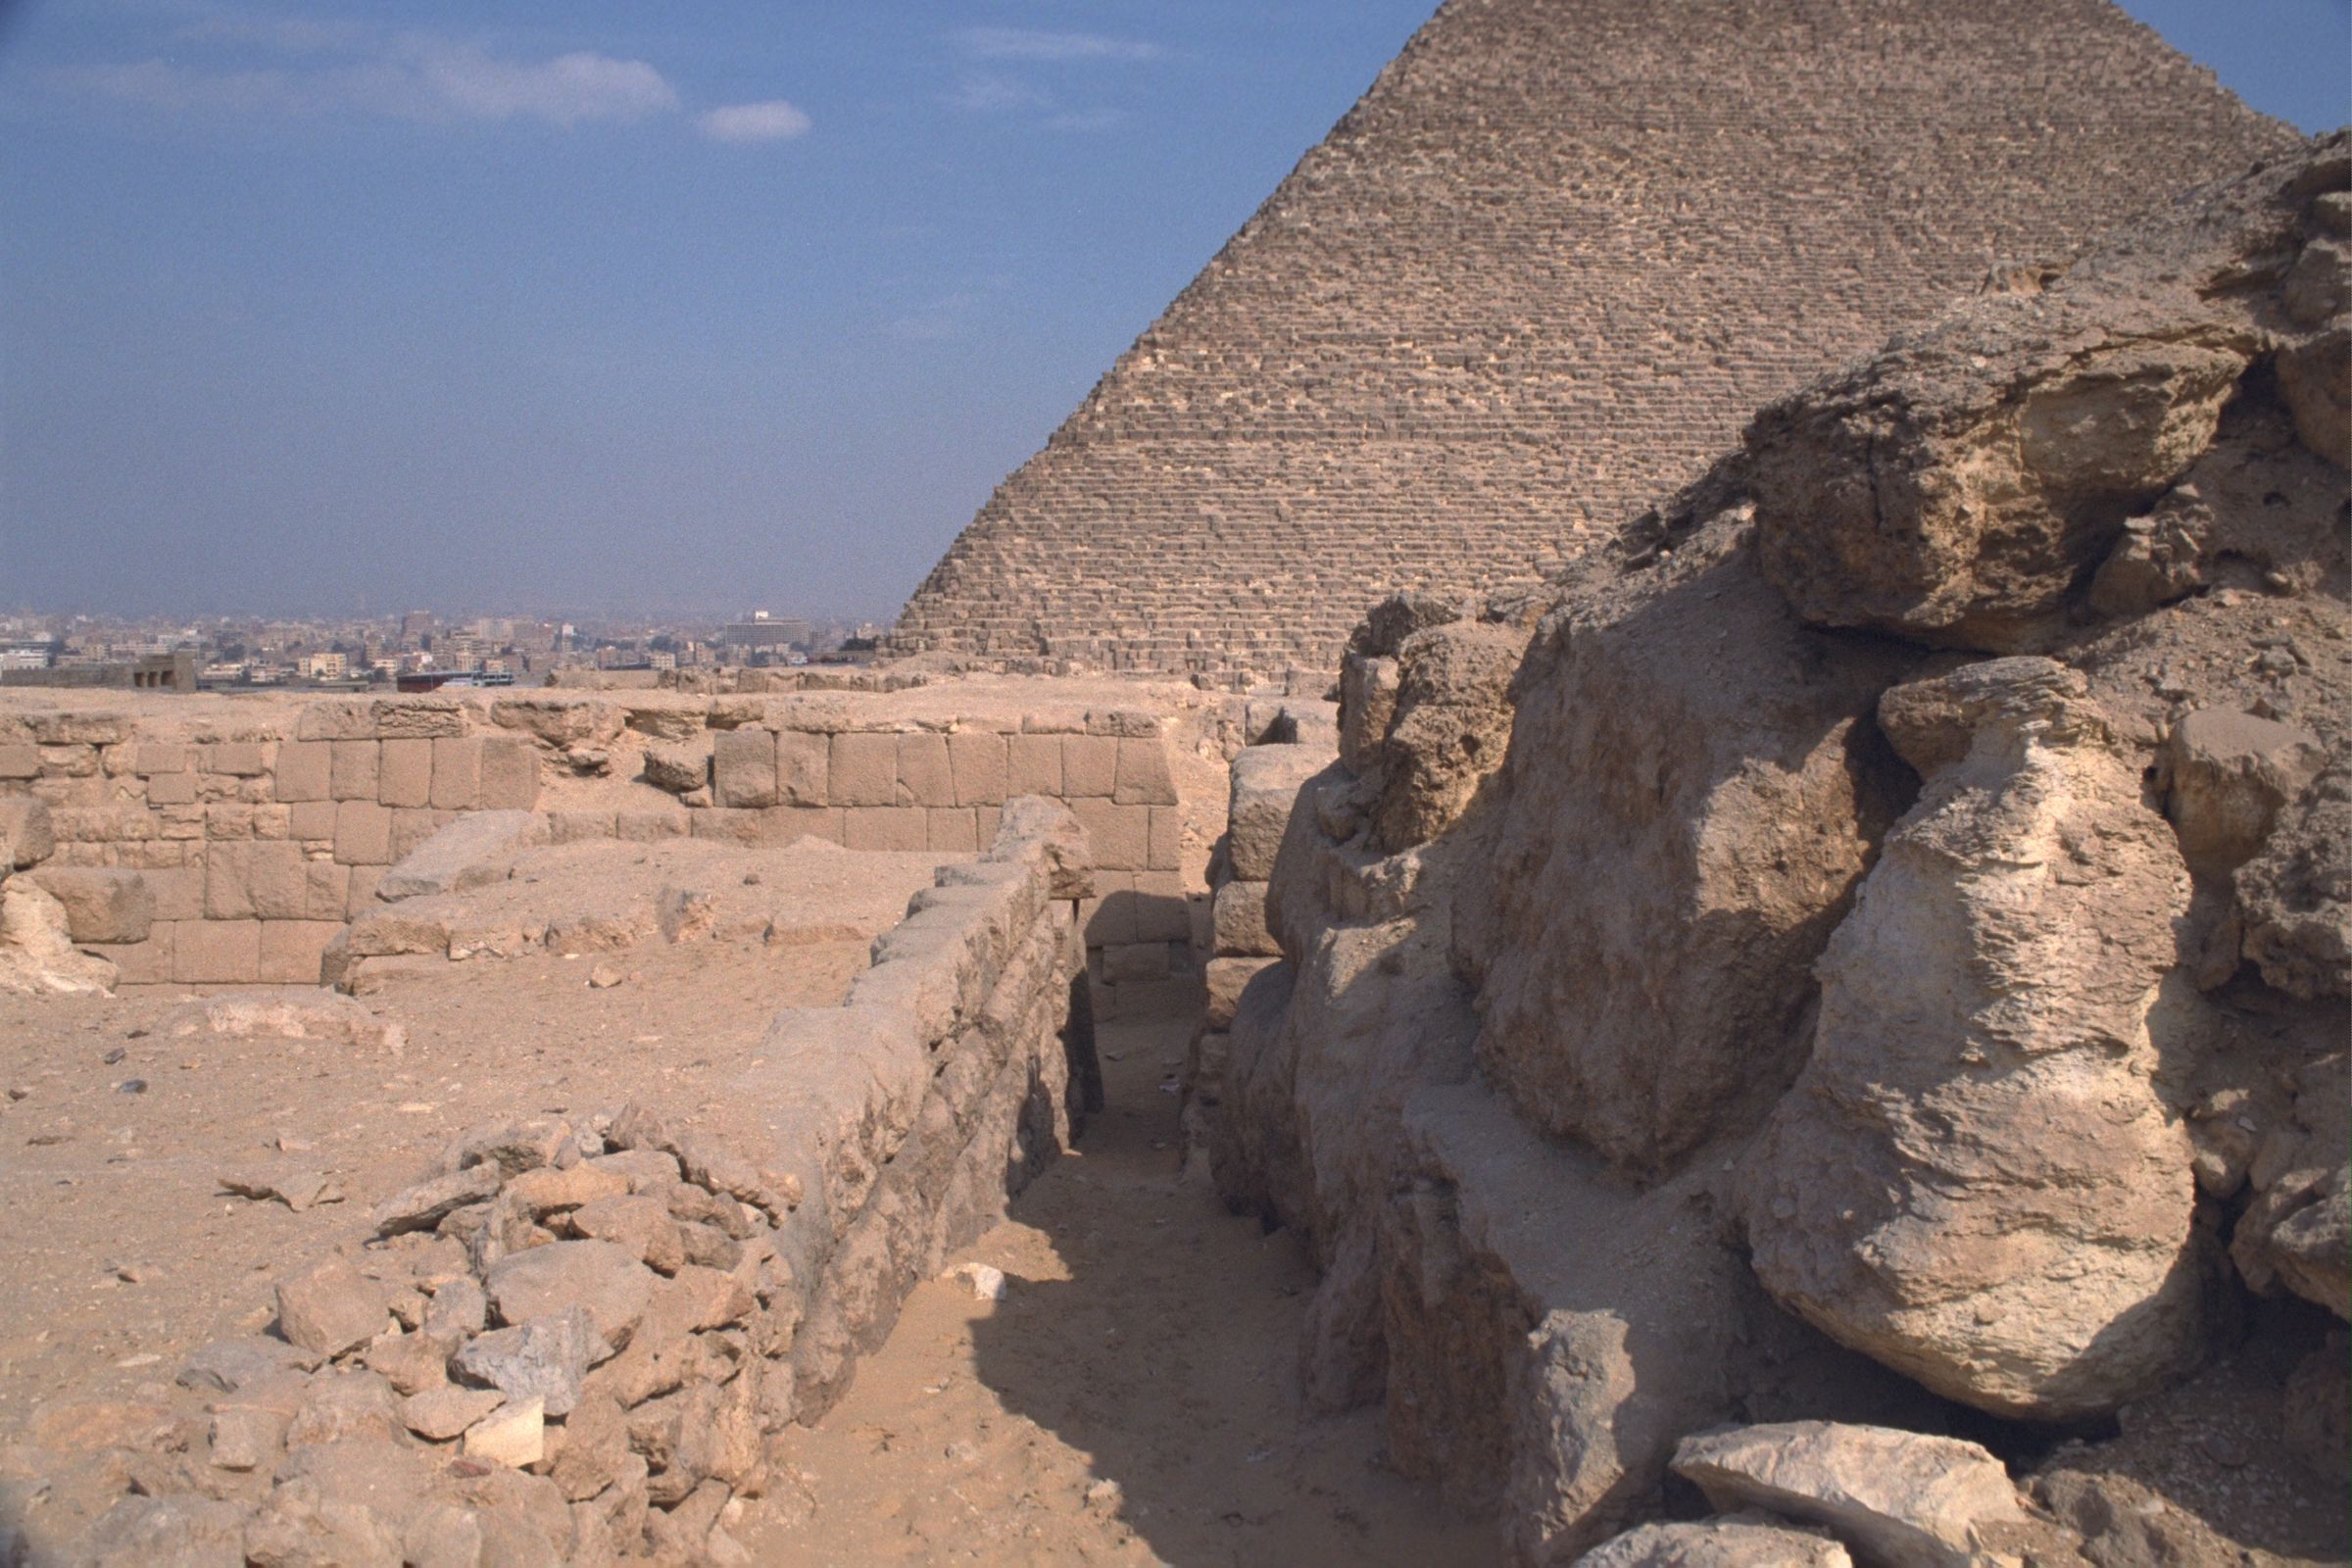 Western Cemetery: Site: Giza; View: Qedfy (G 2135a), G 2155, G 4760